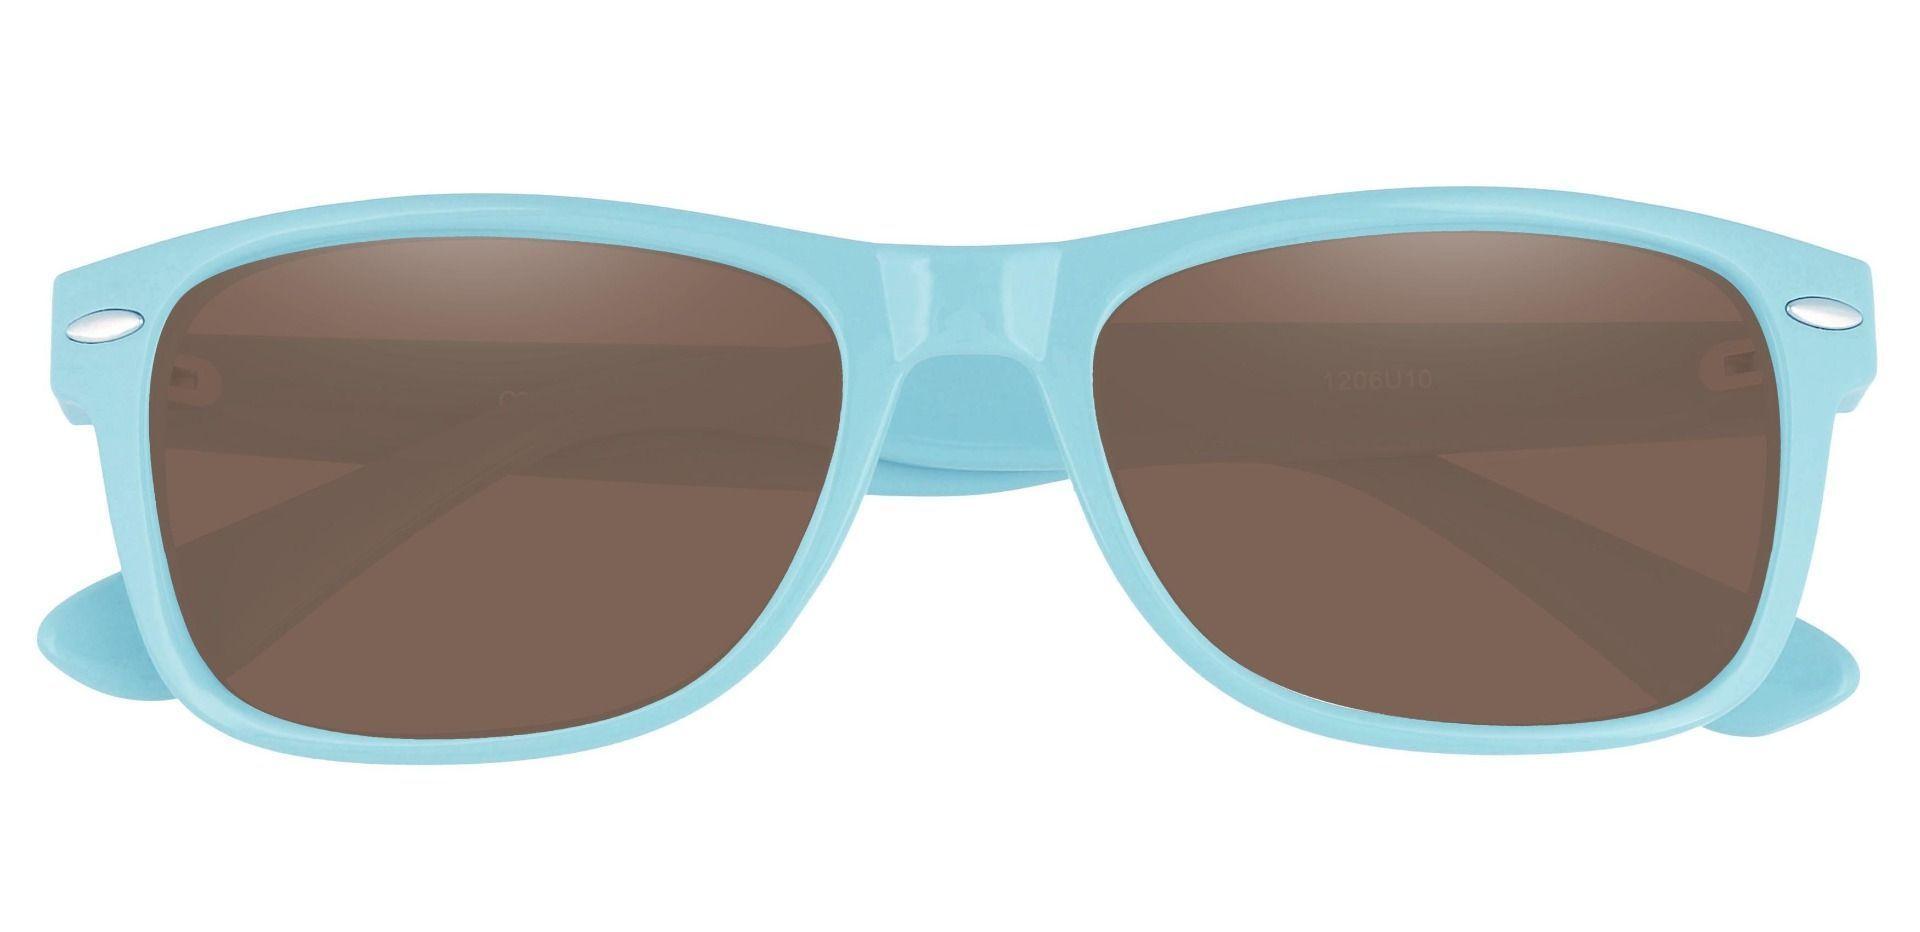 Kent Rectangle Prescription Sunglasses - Blue Frame With Brown Lenses